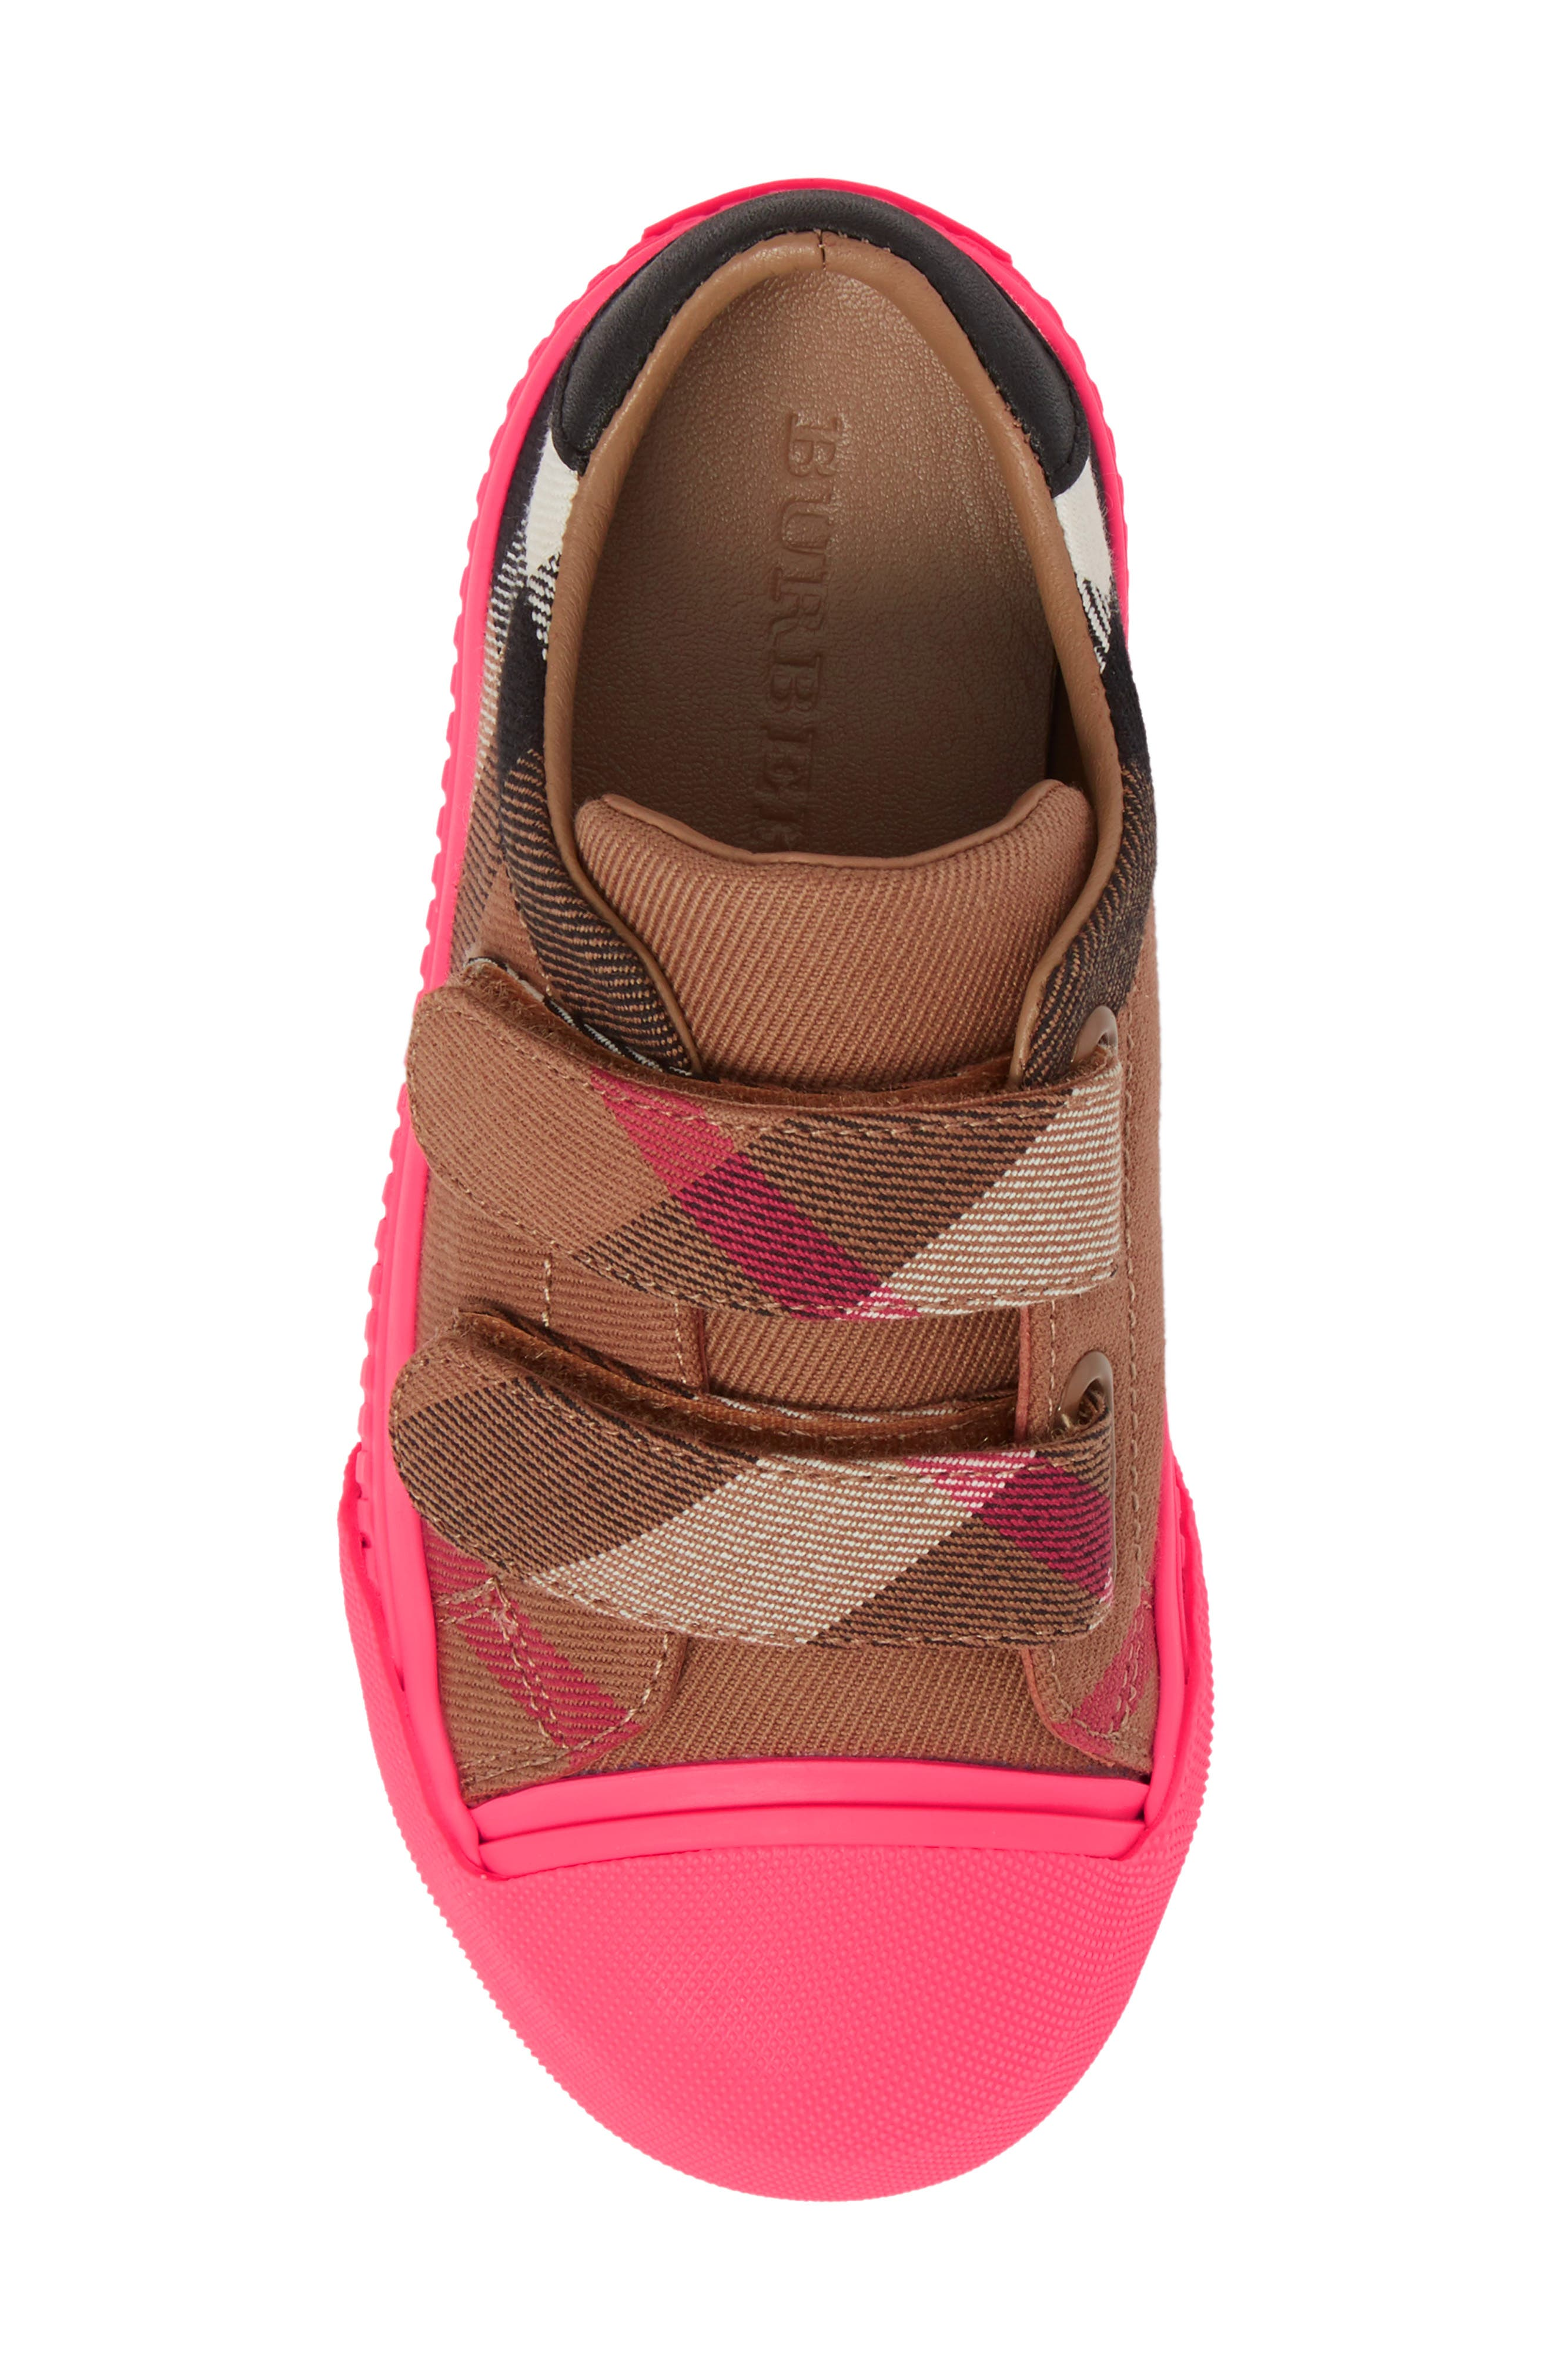 Belside Sneaker,                             Alternate thumbnail 5, color,                             Classic/ Neon Pink